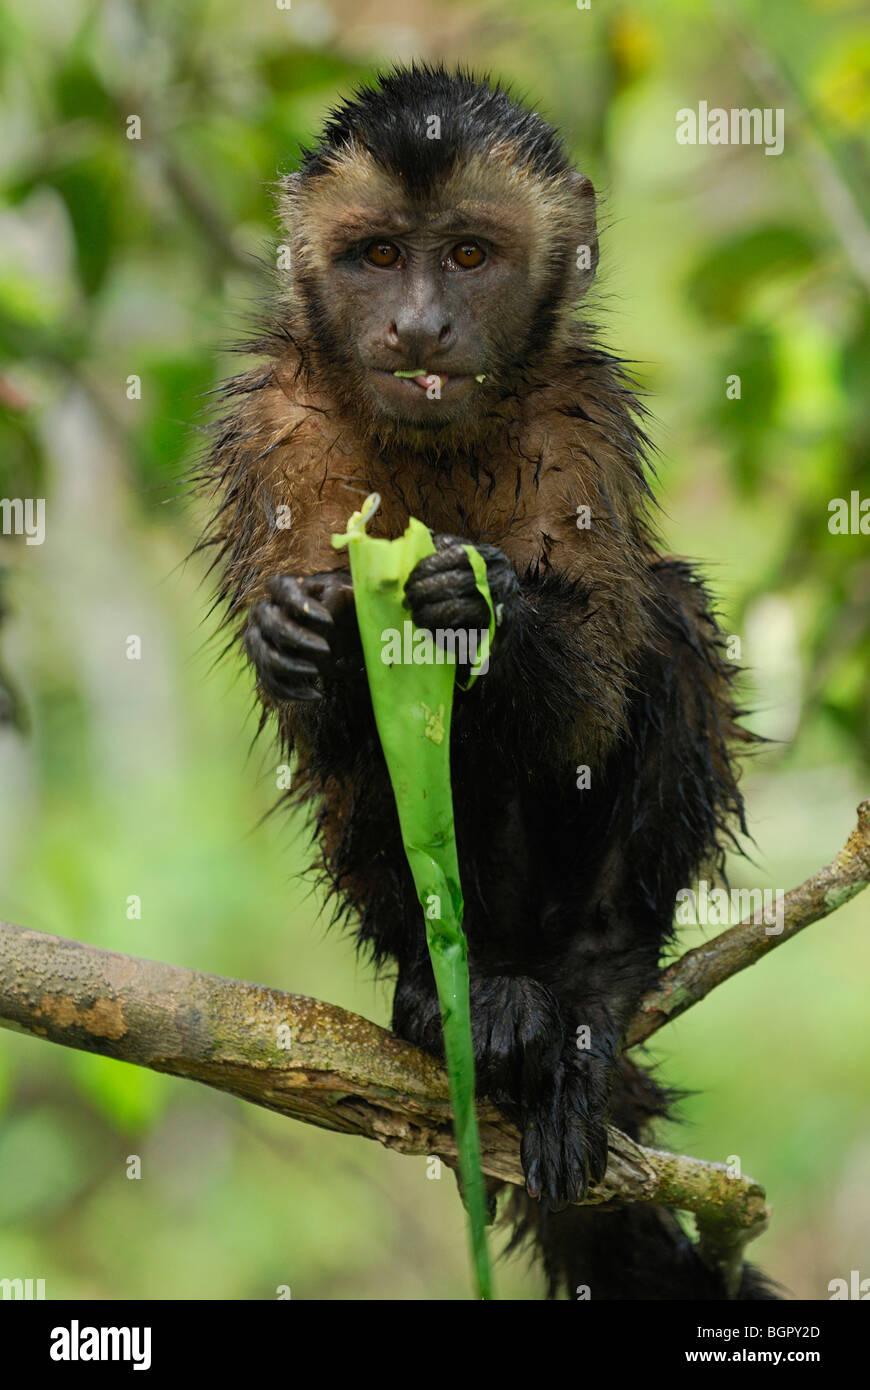 Tufted or Brown Capuchin (Cebus apella), adult eating, Pacaya-Samiria National Park, Peru - Stock Image